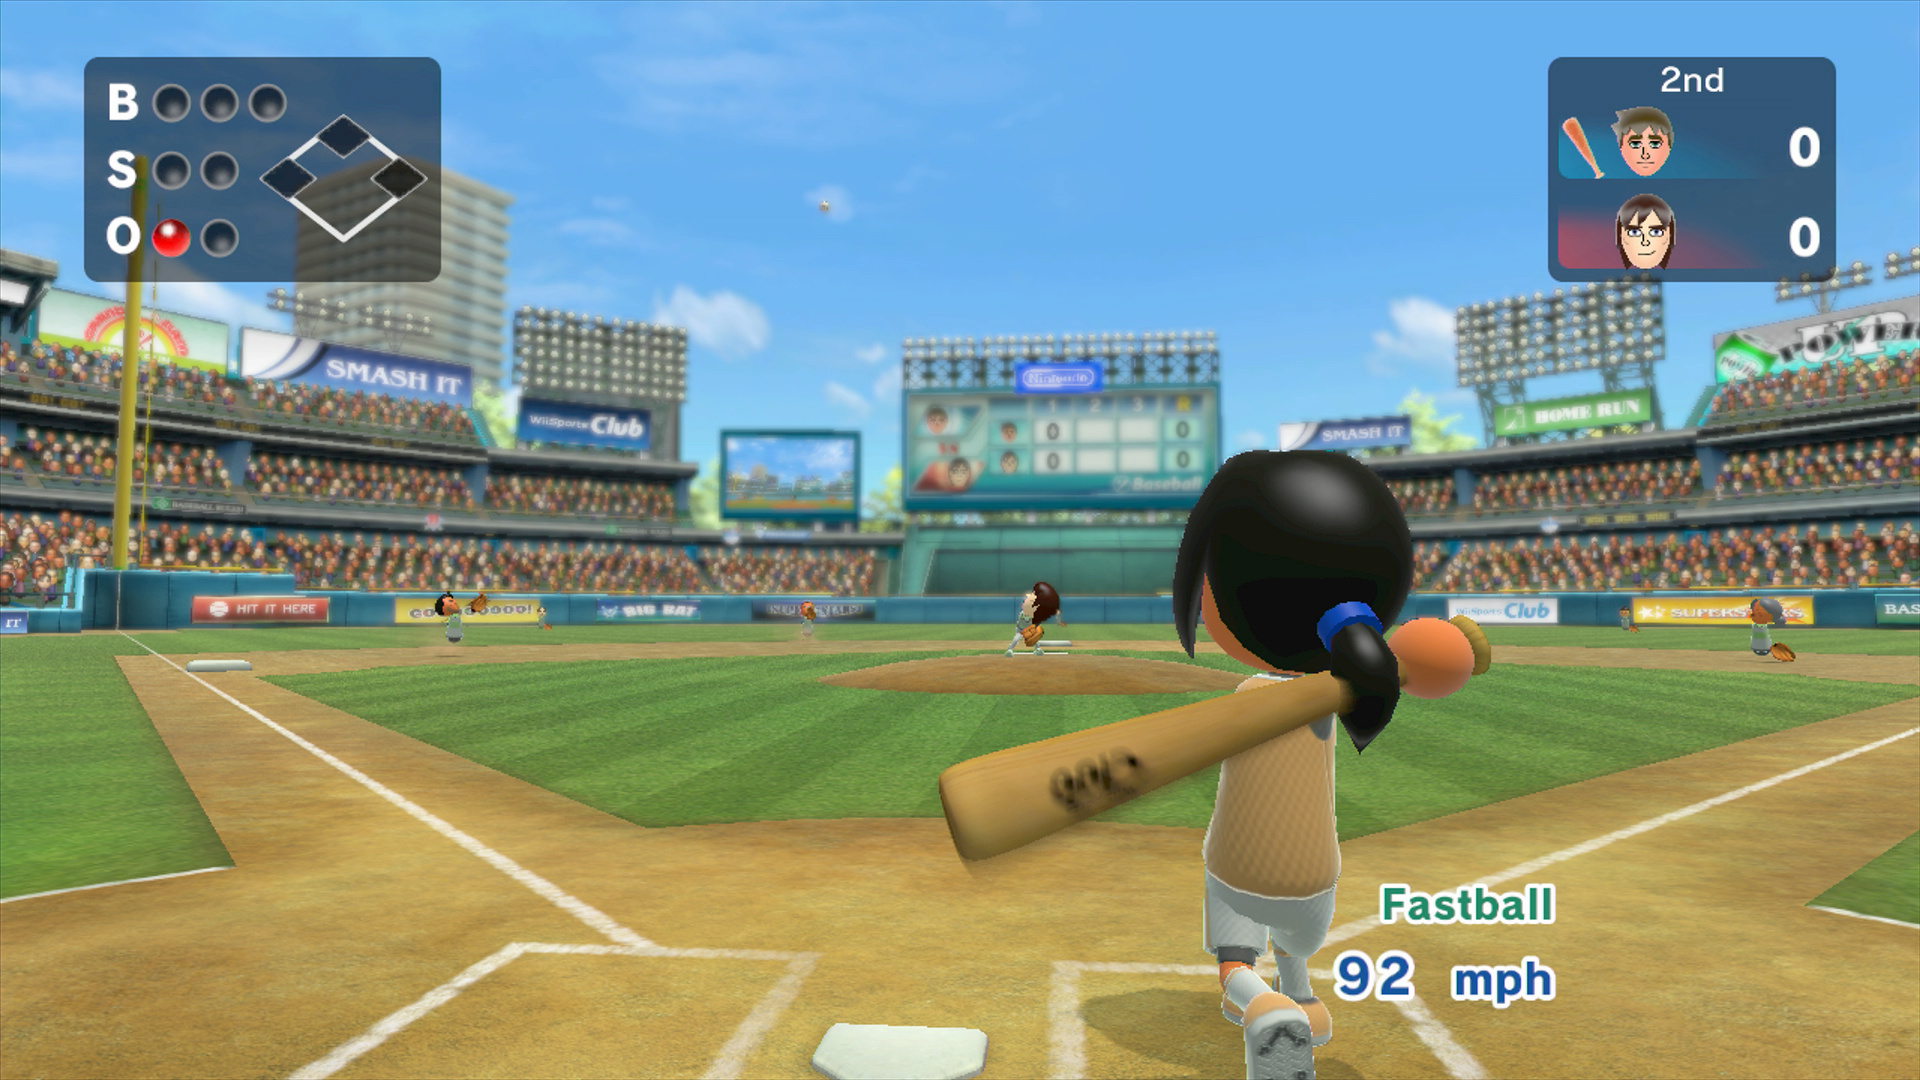 wii sports club baseball boxing review wii u eshop nintendo life rh nintendolife com Wii Sports Resort Wii Sports Golf